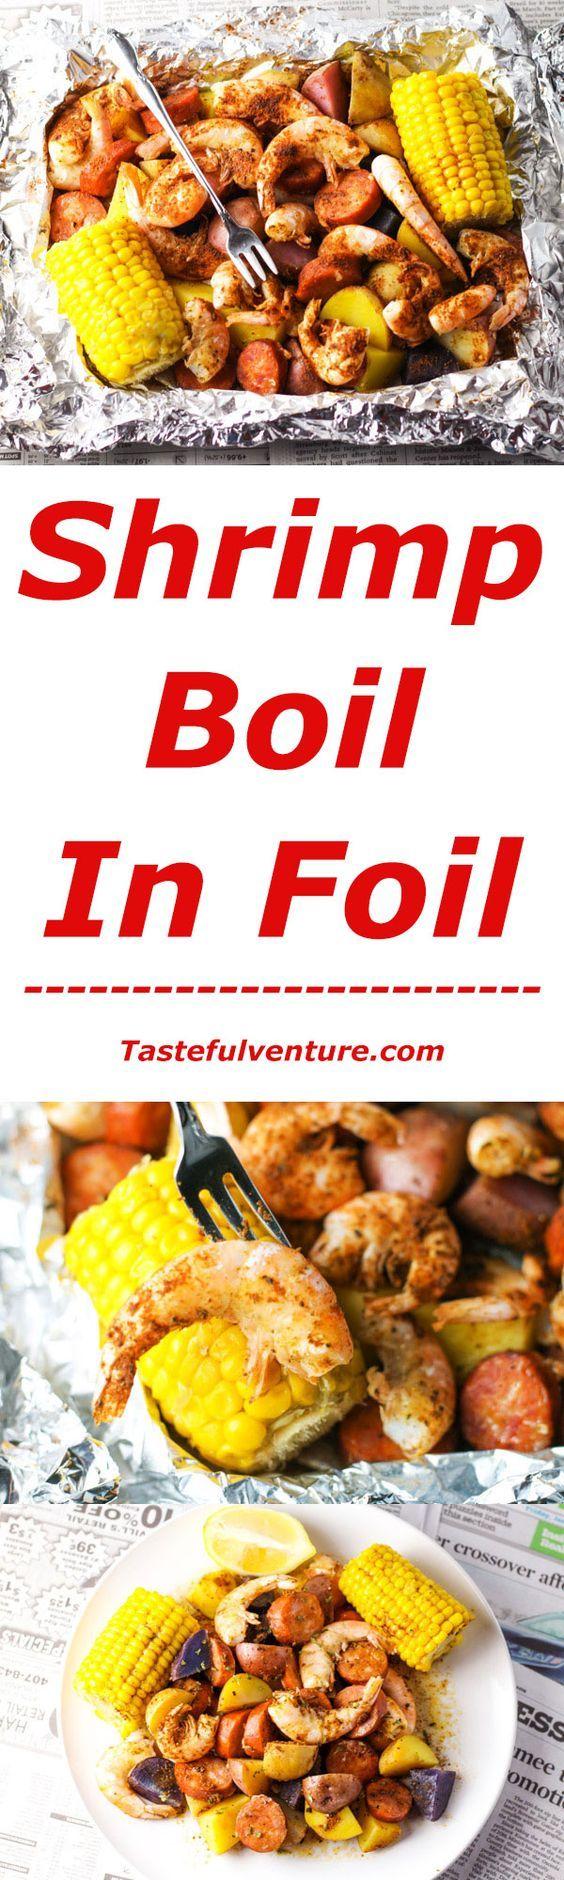 25+ best ideas about Cajun Seafood Boil on Pinterest ...